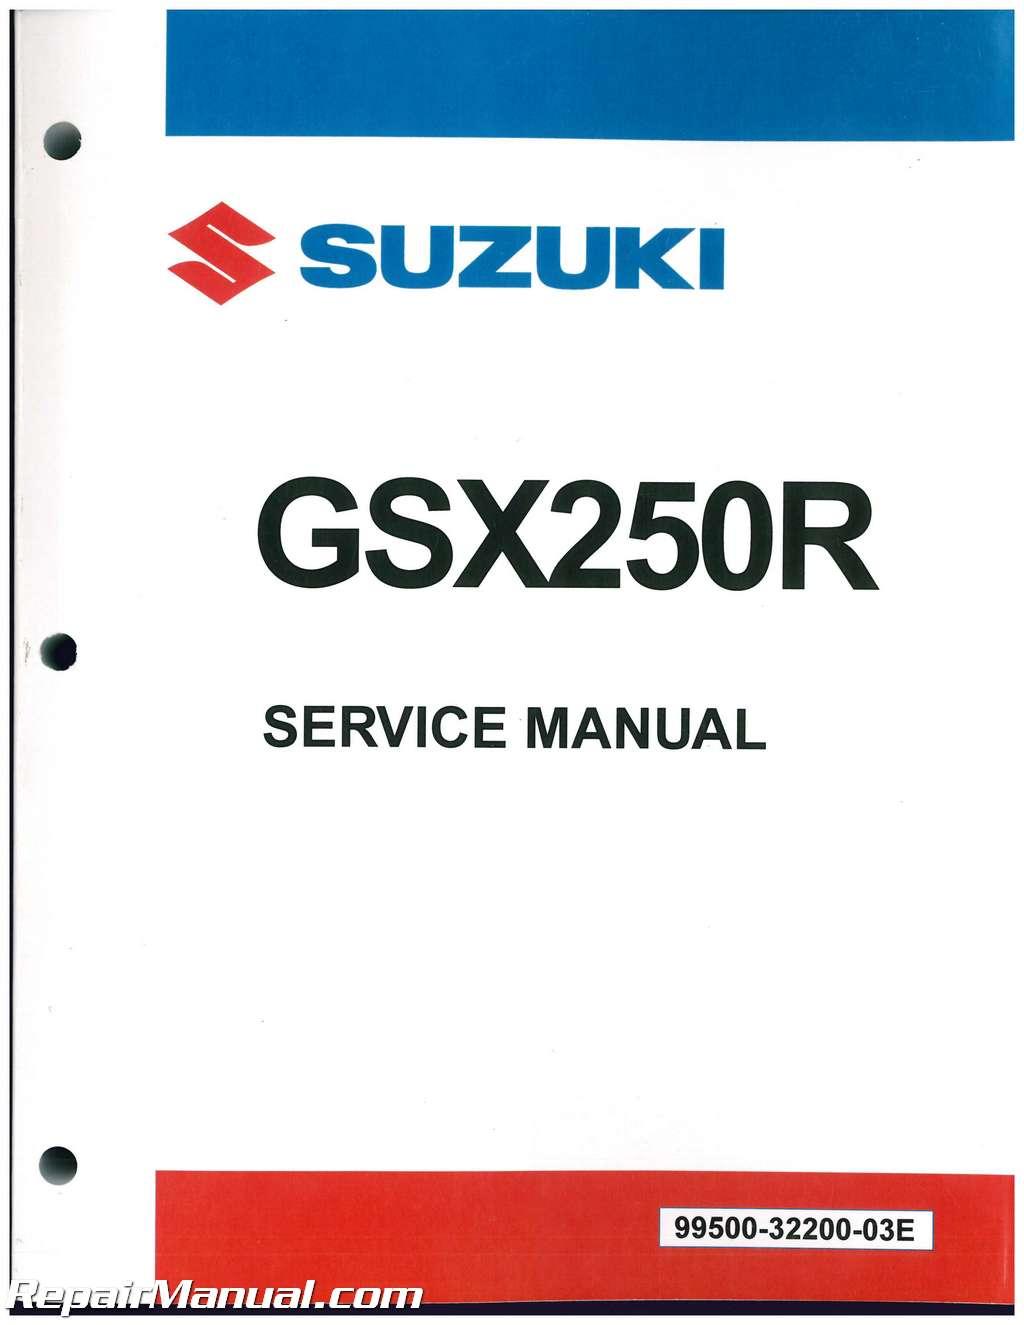 2018 Suzuki GSX250R Motorcycle Service Manual